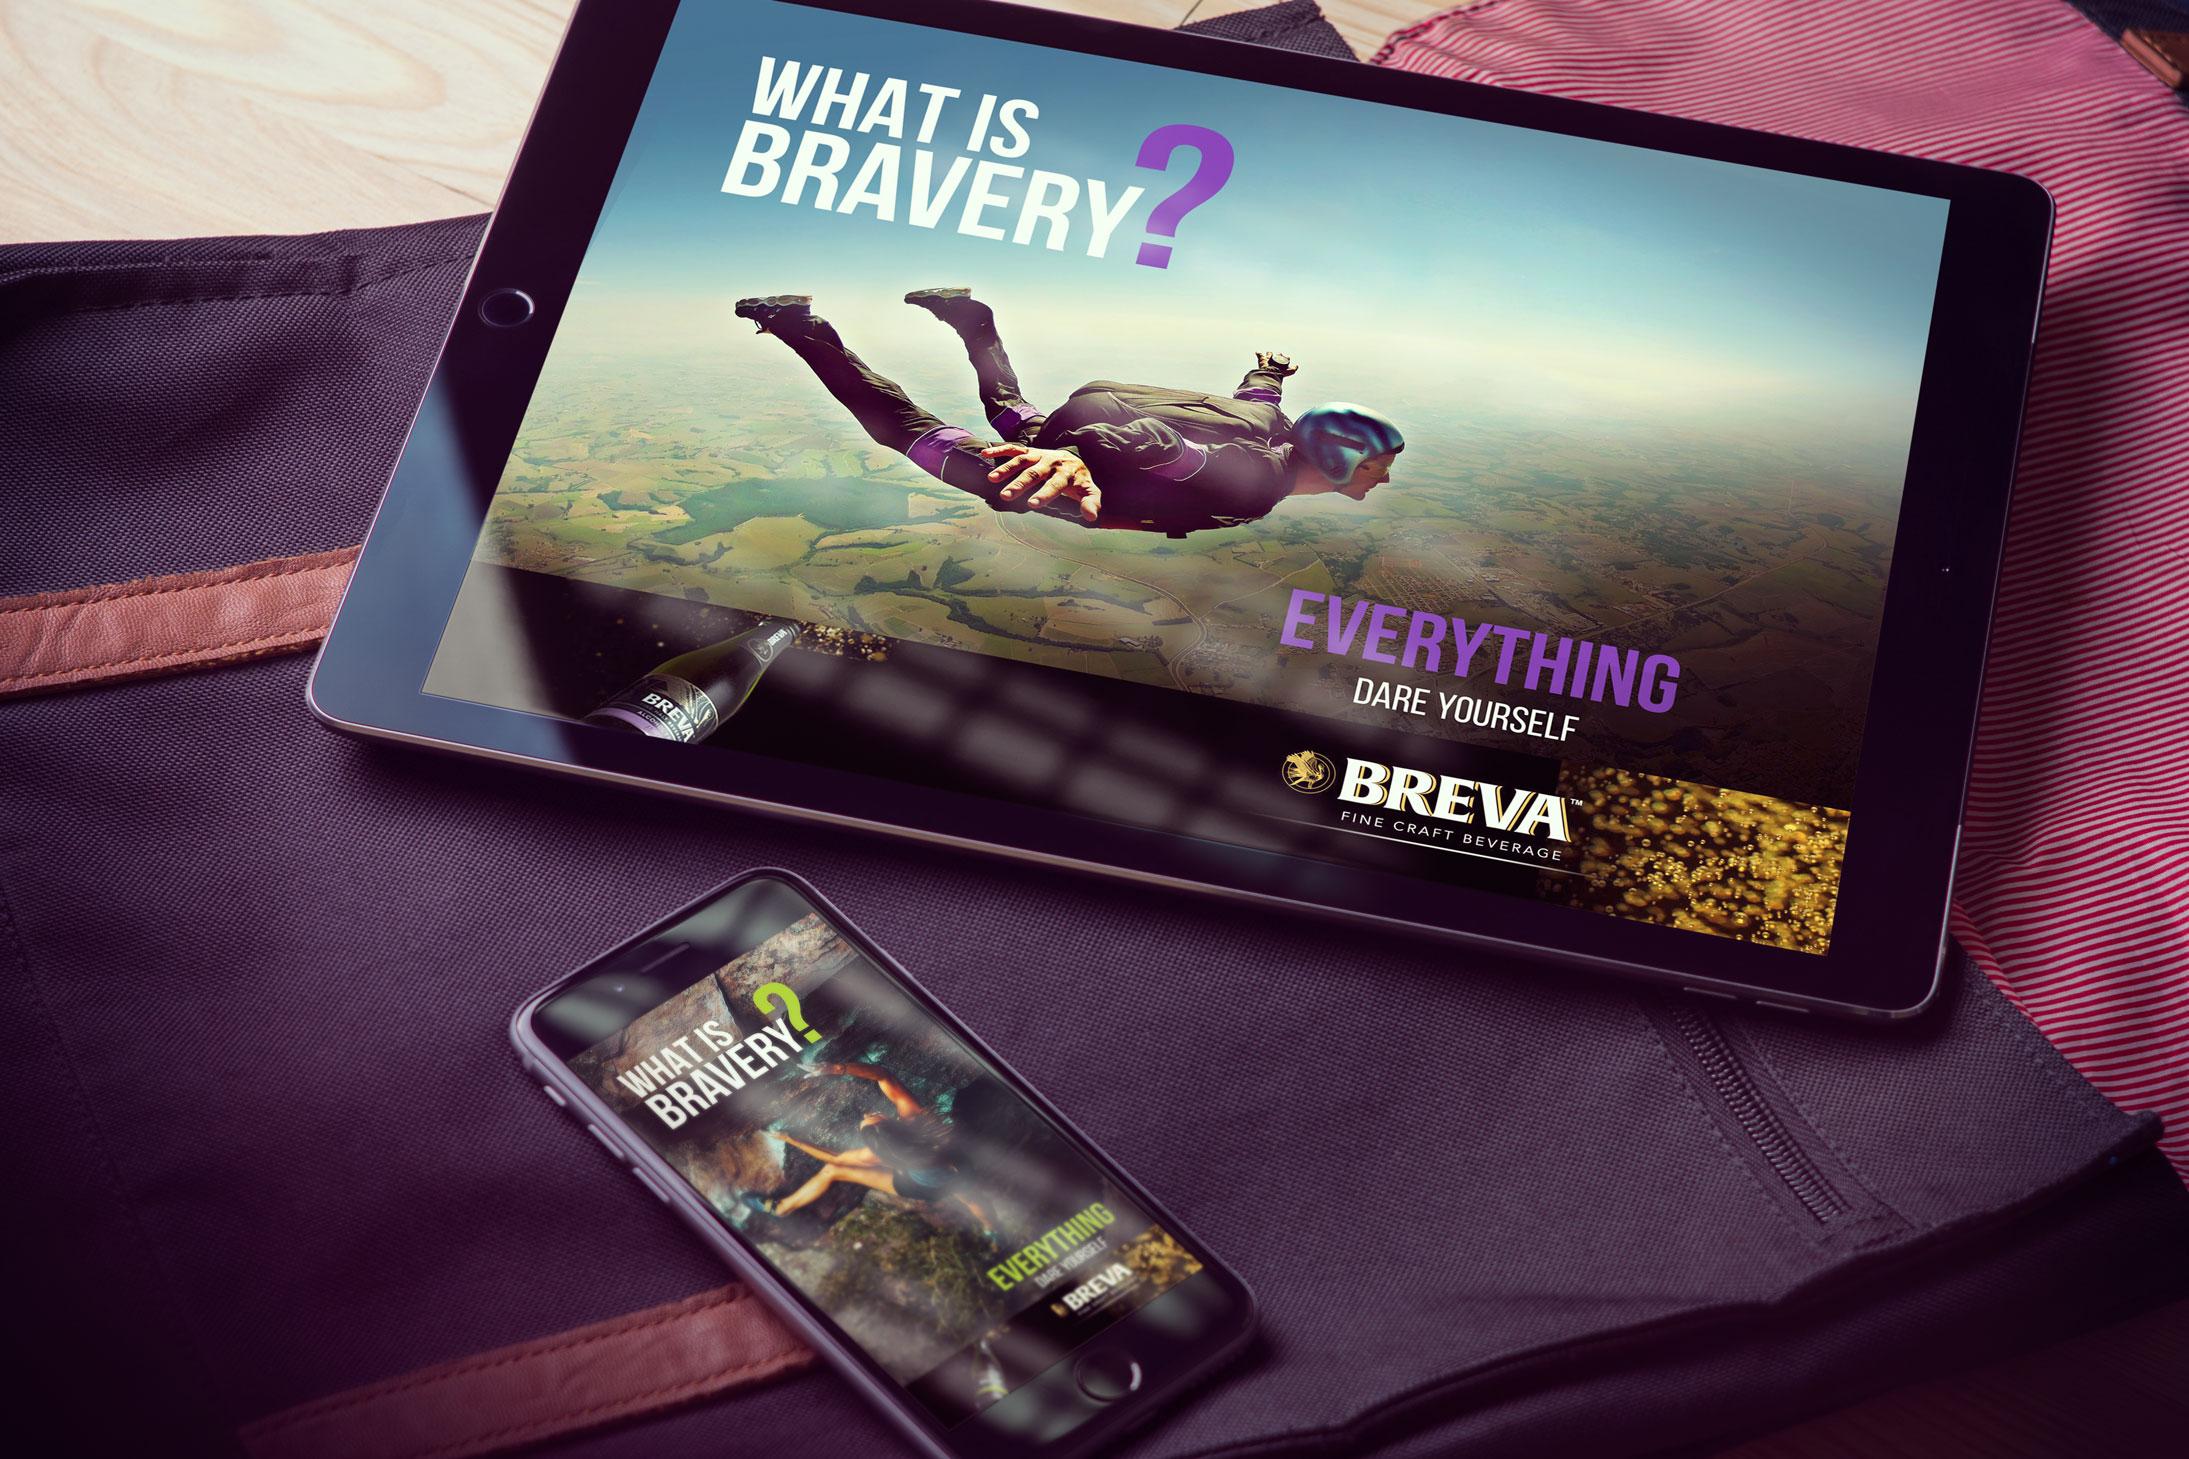 Tablet / Phone